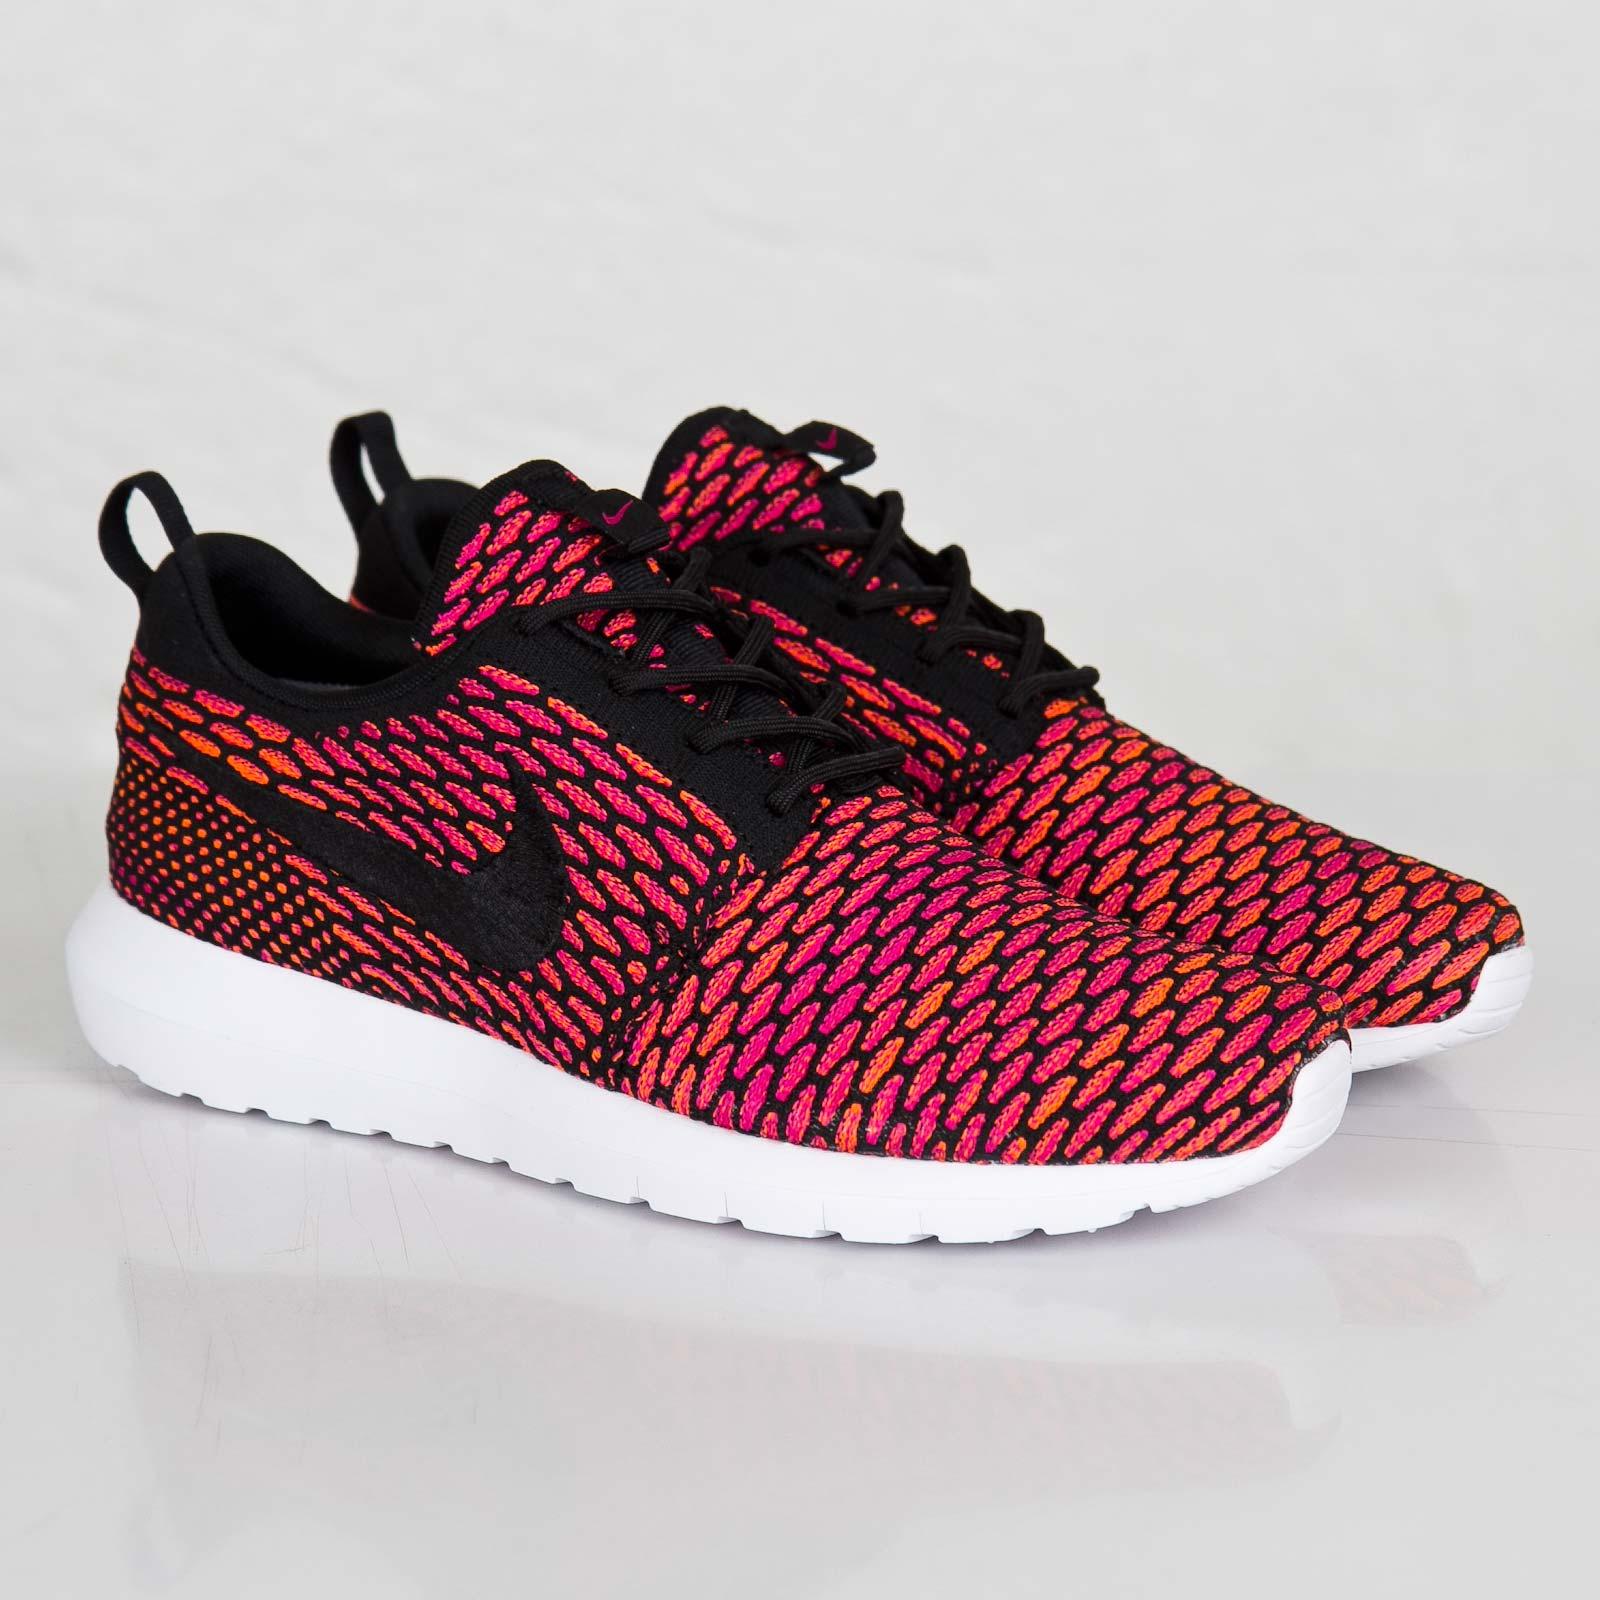 739ad60416cb Nike Flyknit Roshe Run - 677243-004 - Sneakersnstuff